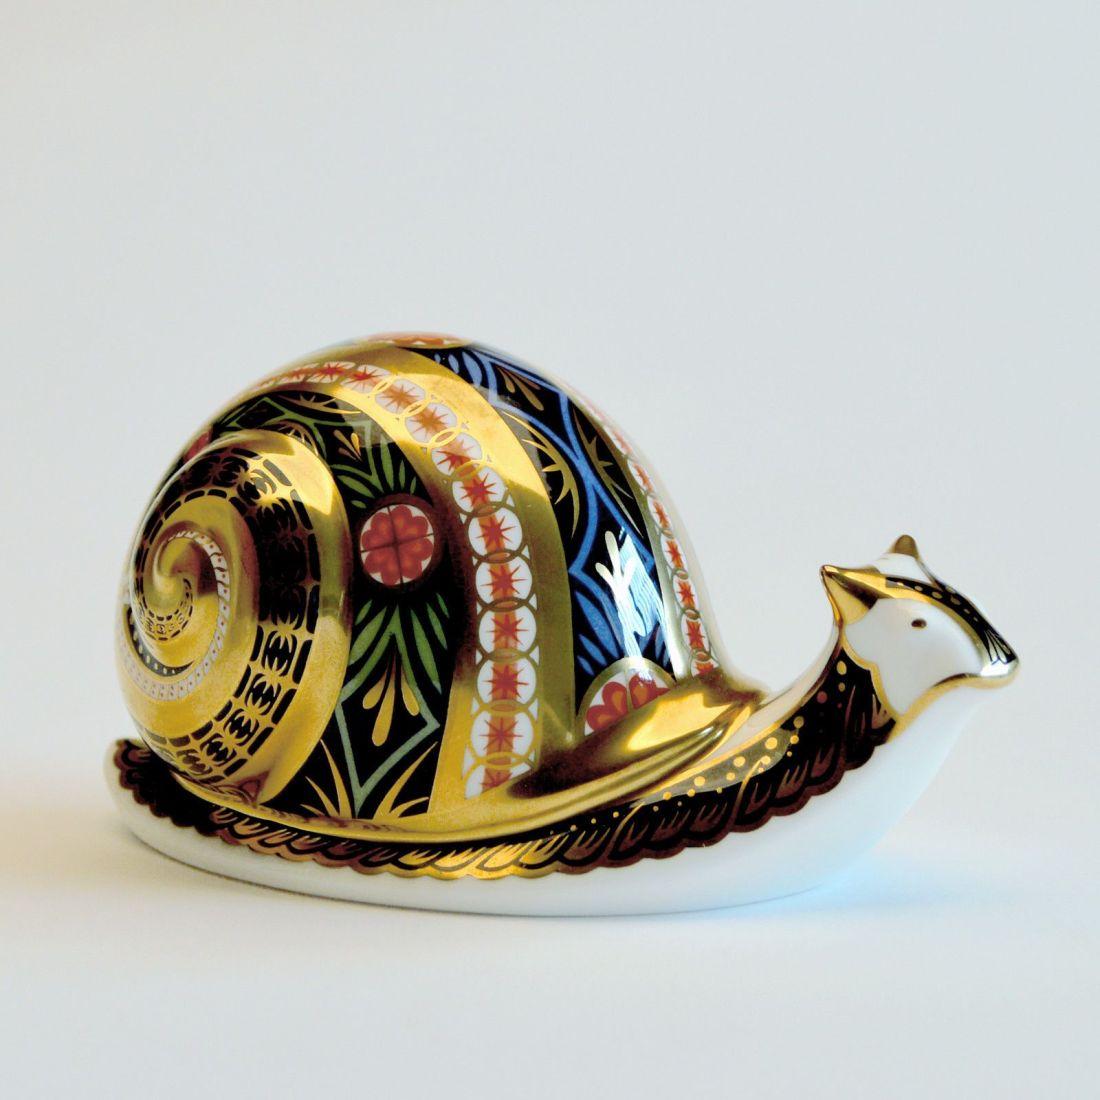 Garden snail paperweight. Royal Crown Derby.